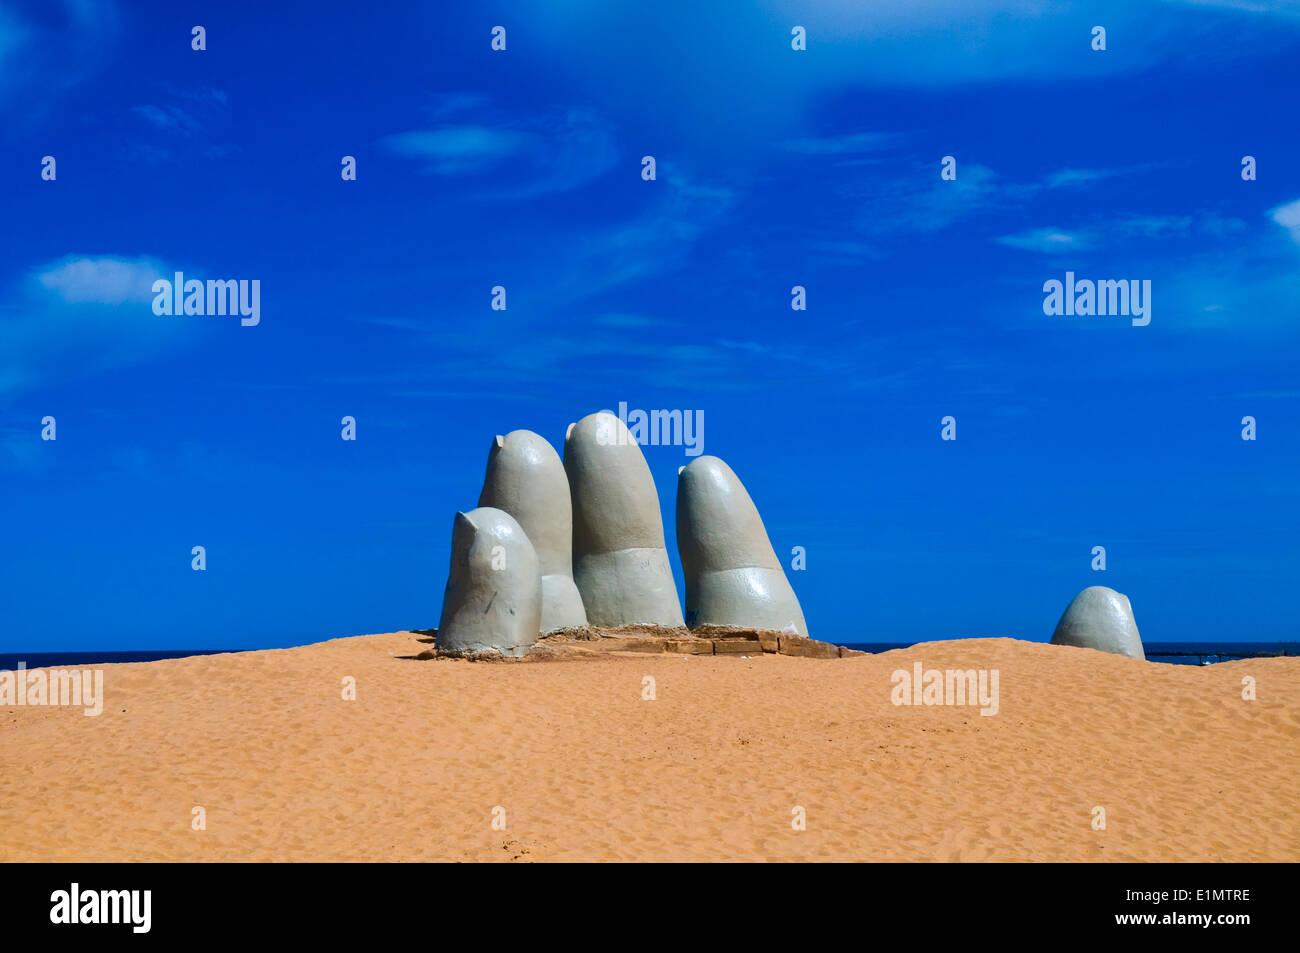 'the Hand' a famous sculpture in 'Punta del este' Uruguay - Stock Image